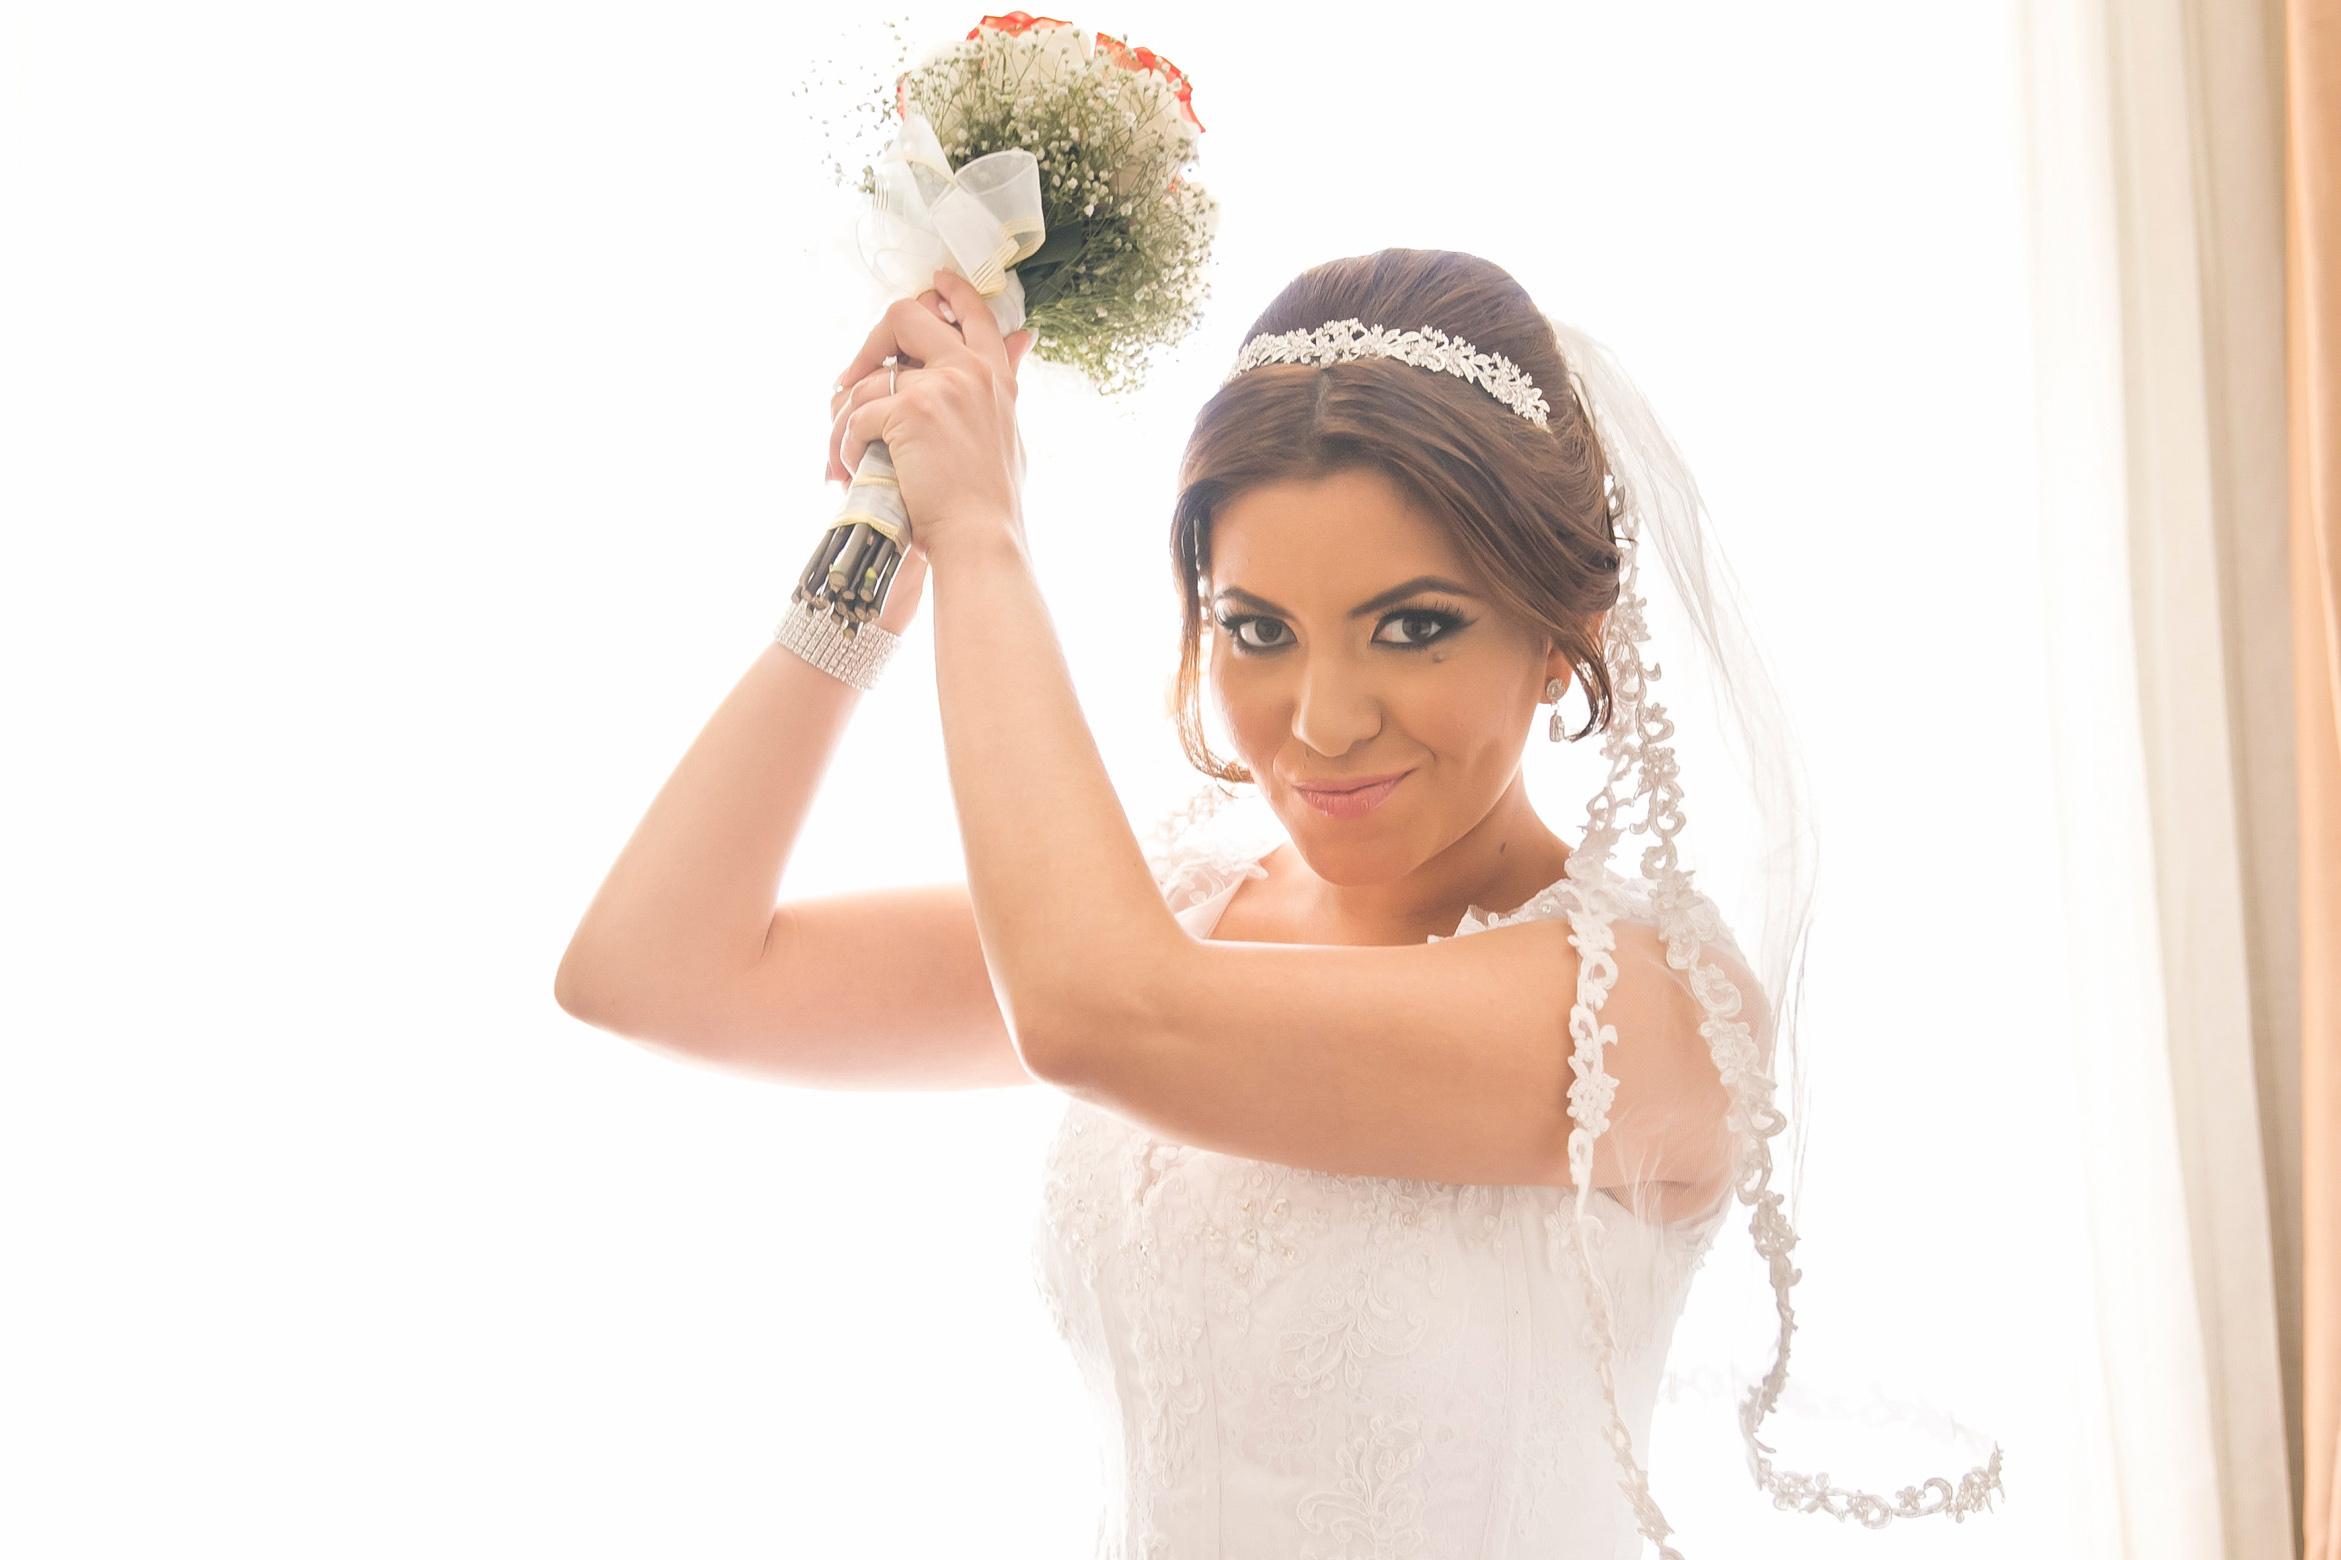 Mike_Mendez_Photography_Wedding_Engagements_16